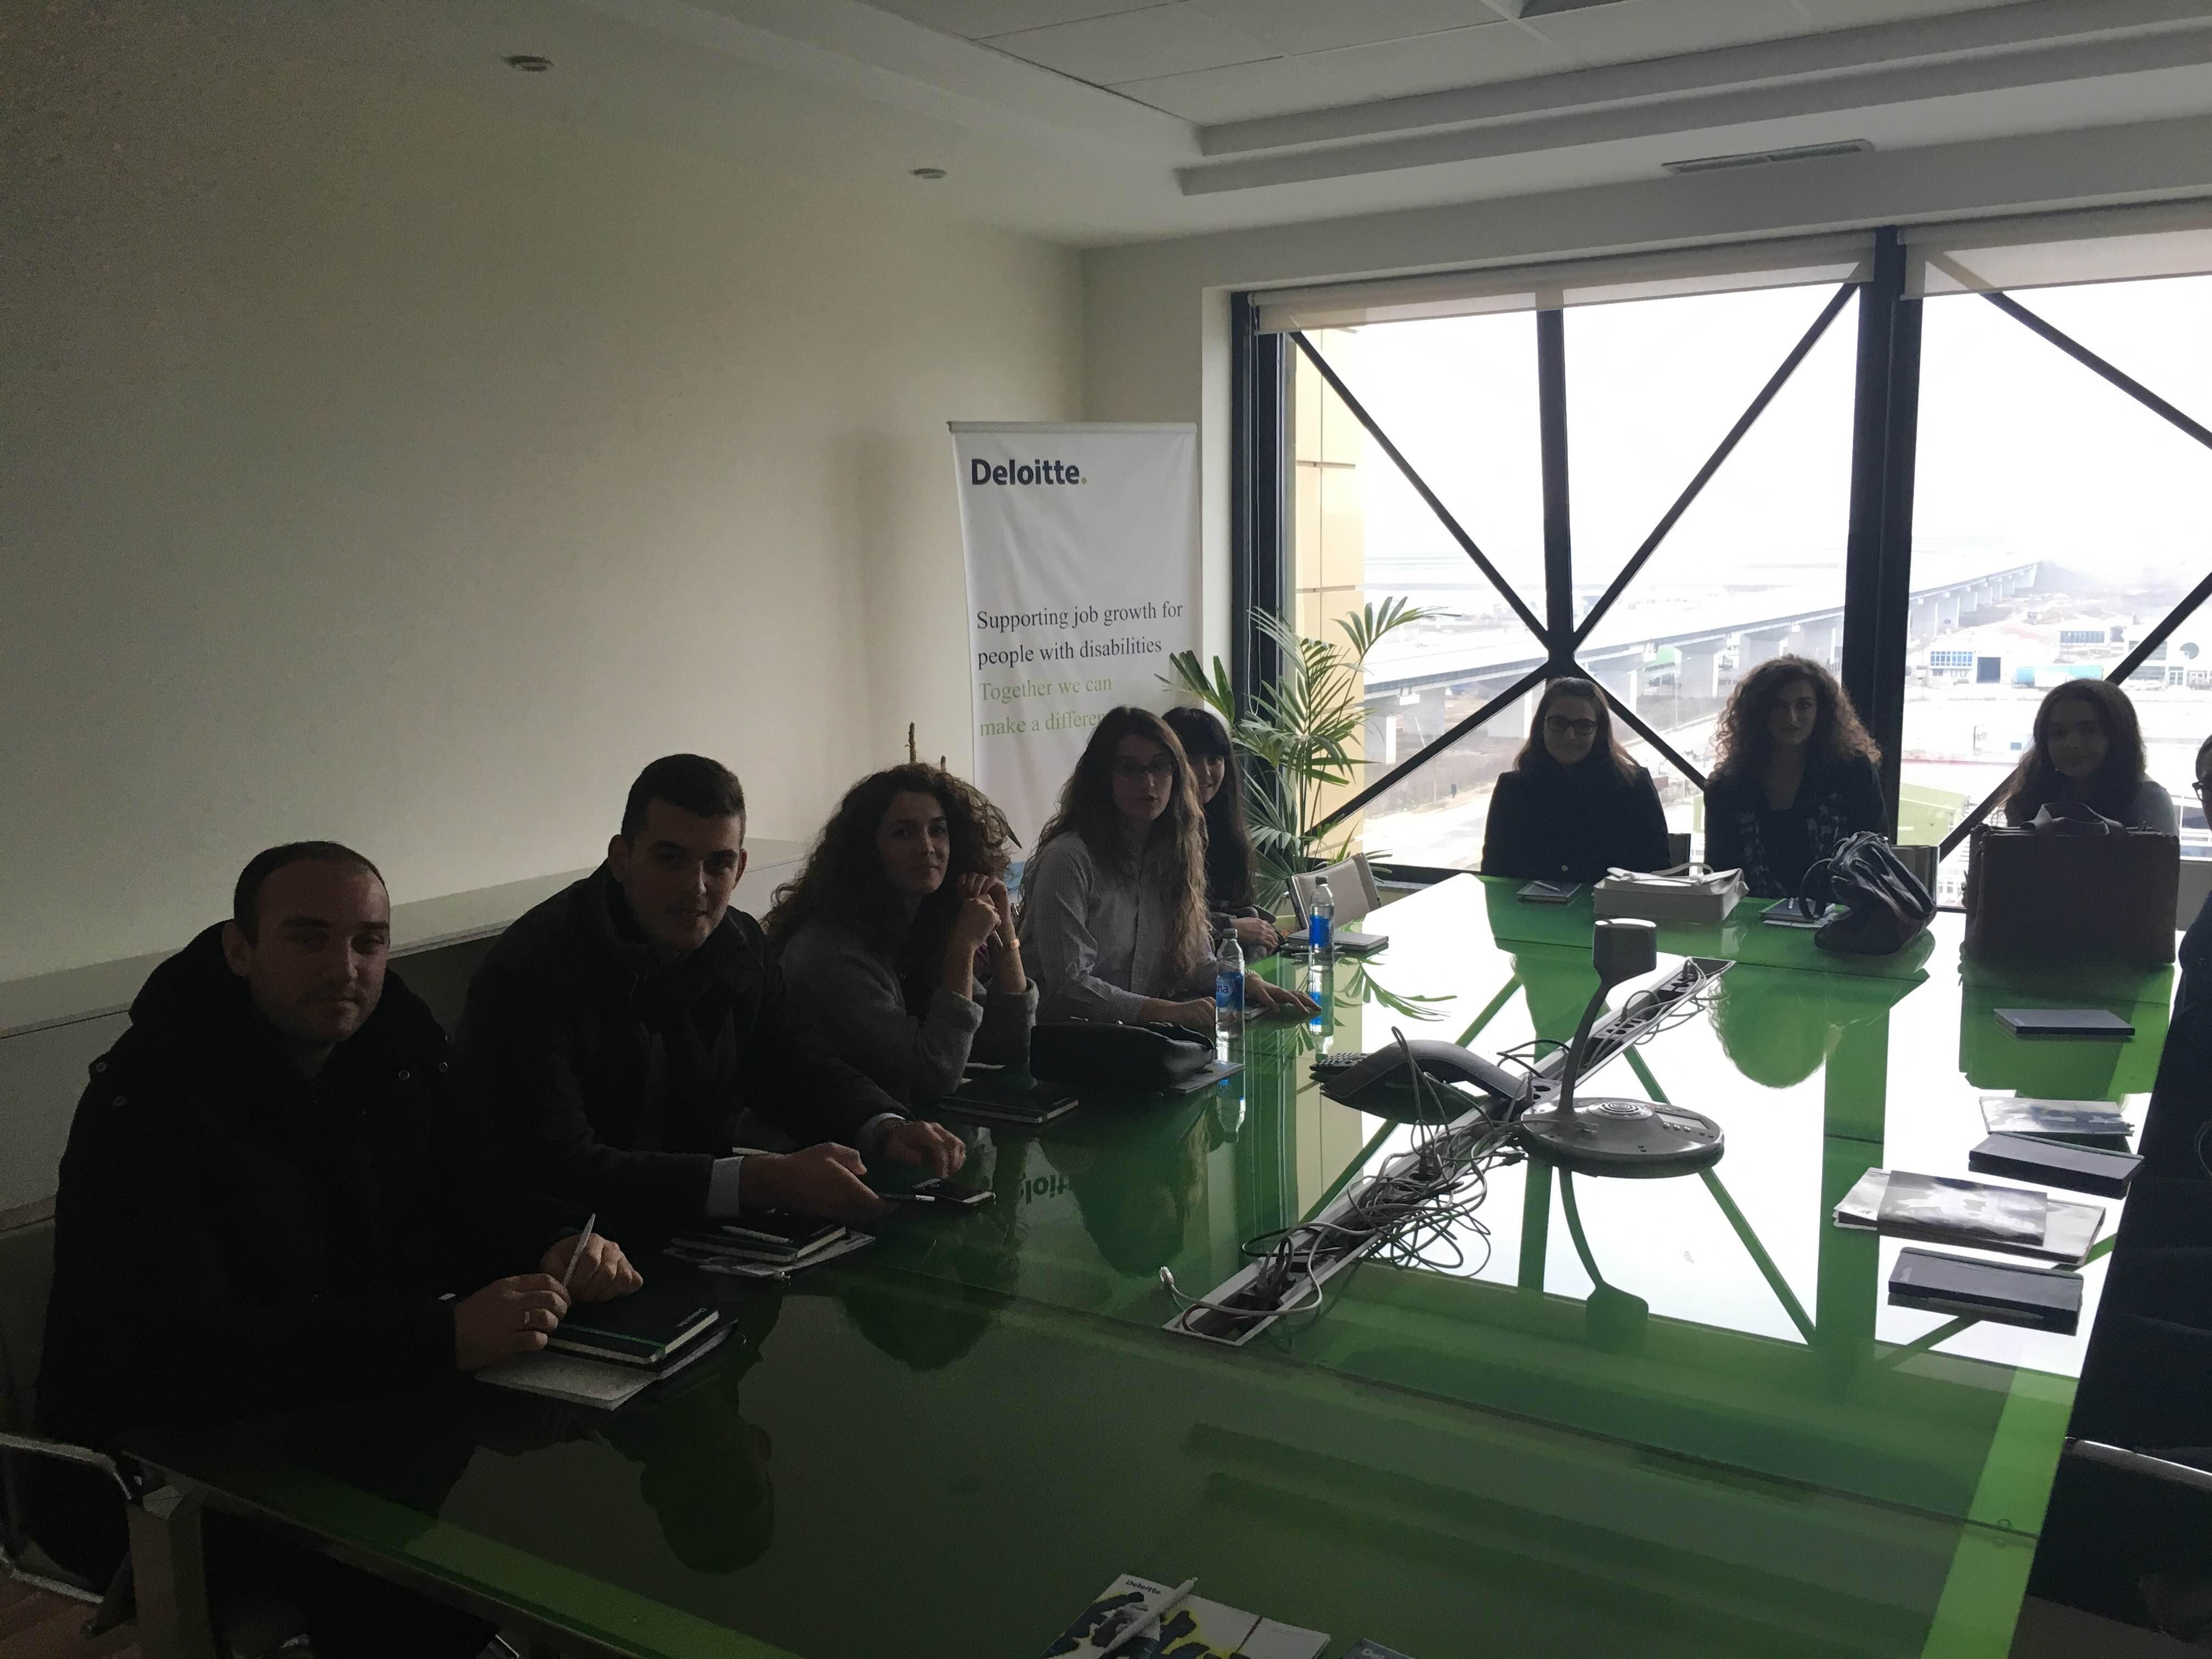 UBT Students Visit Deloitte Company